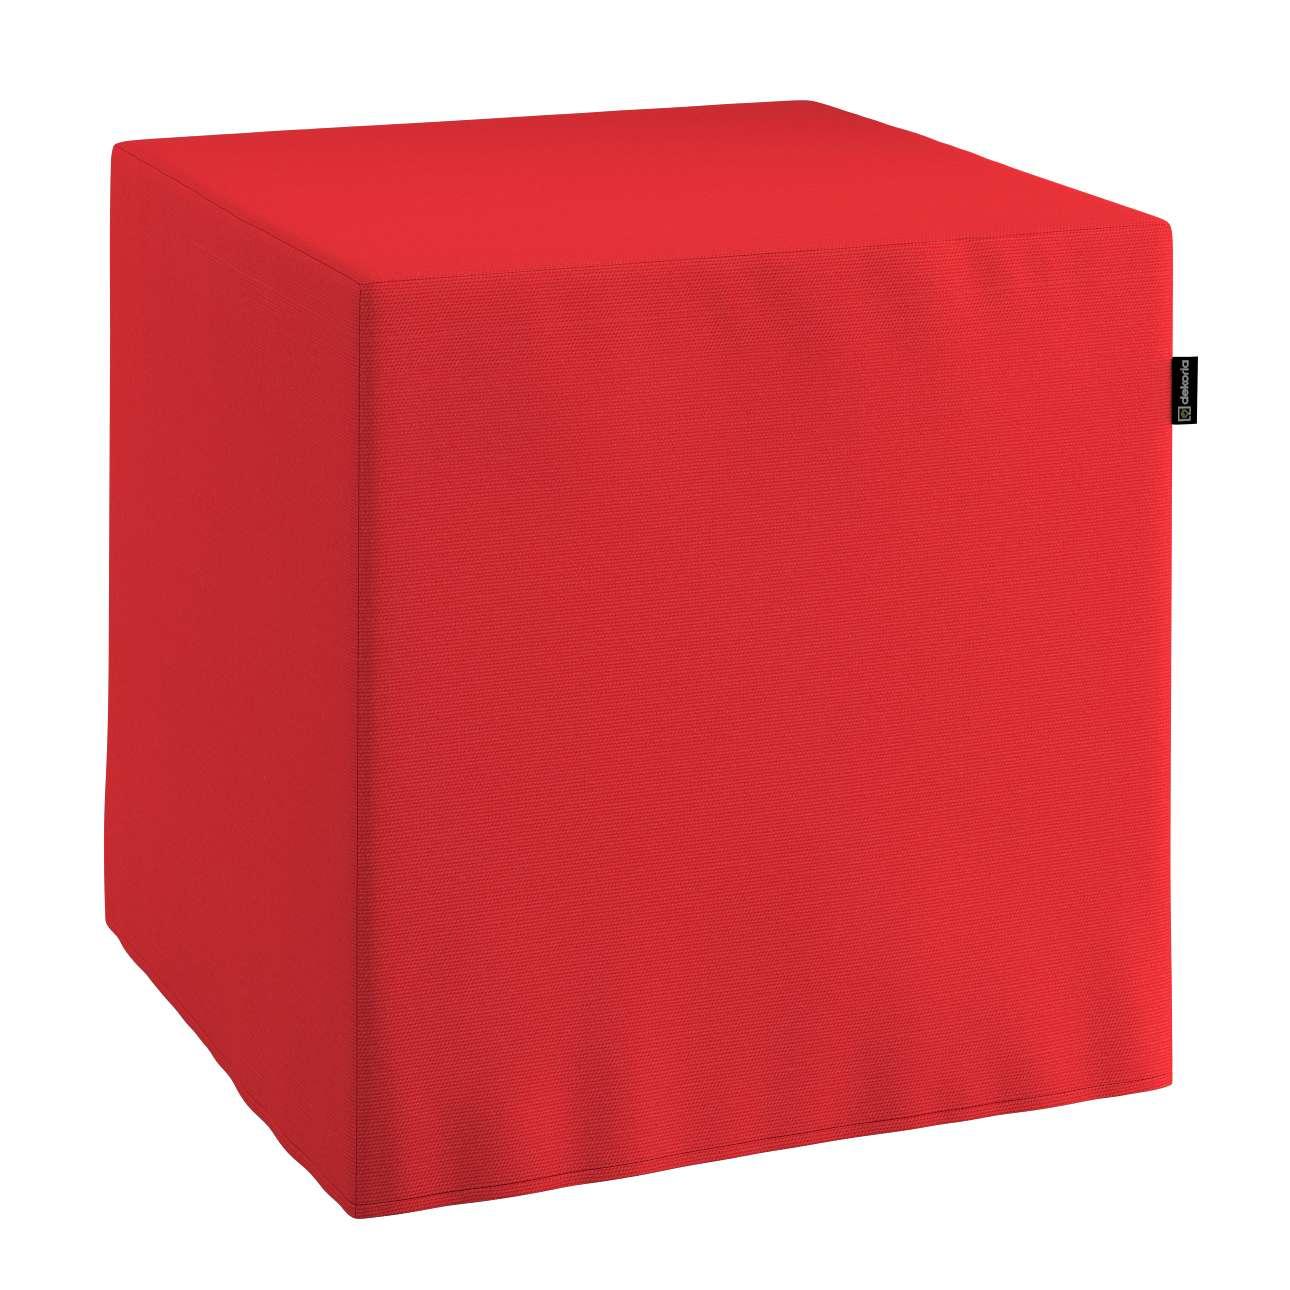 Sedák Cube - kostka pevná 40x40x40 v kolekci Loneta, látka: 133-43